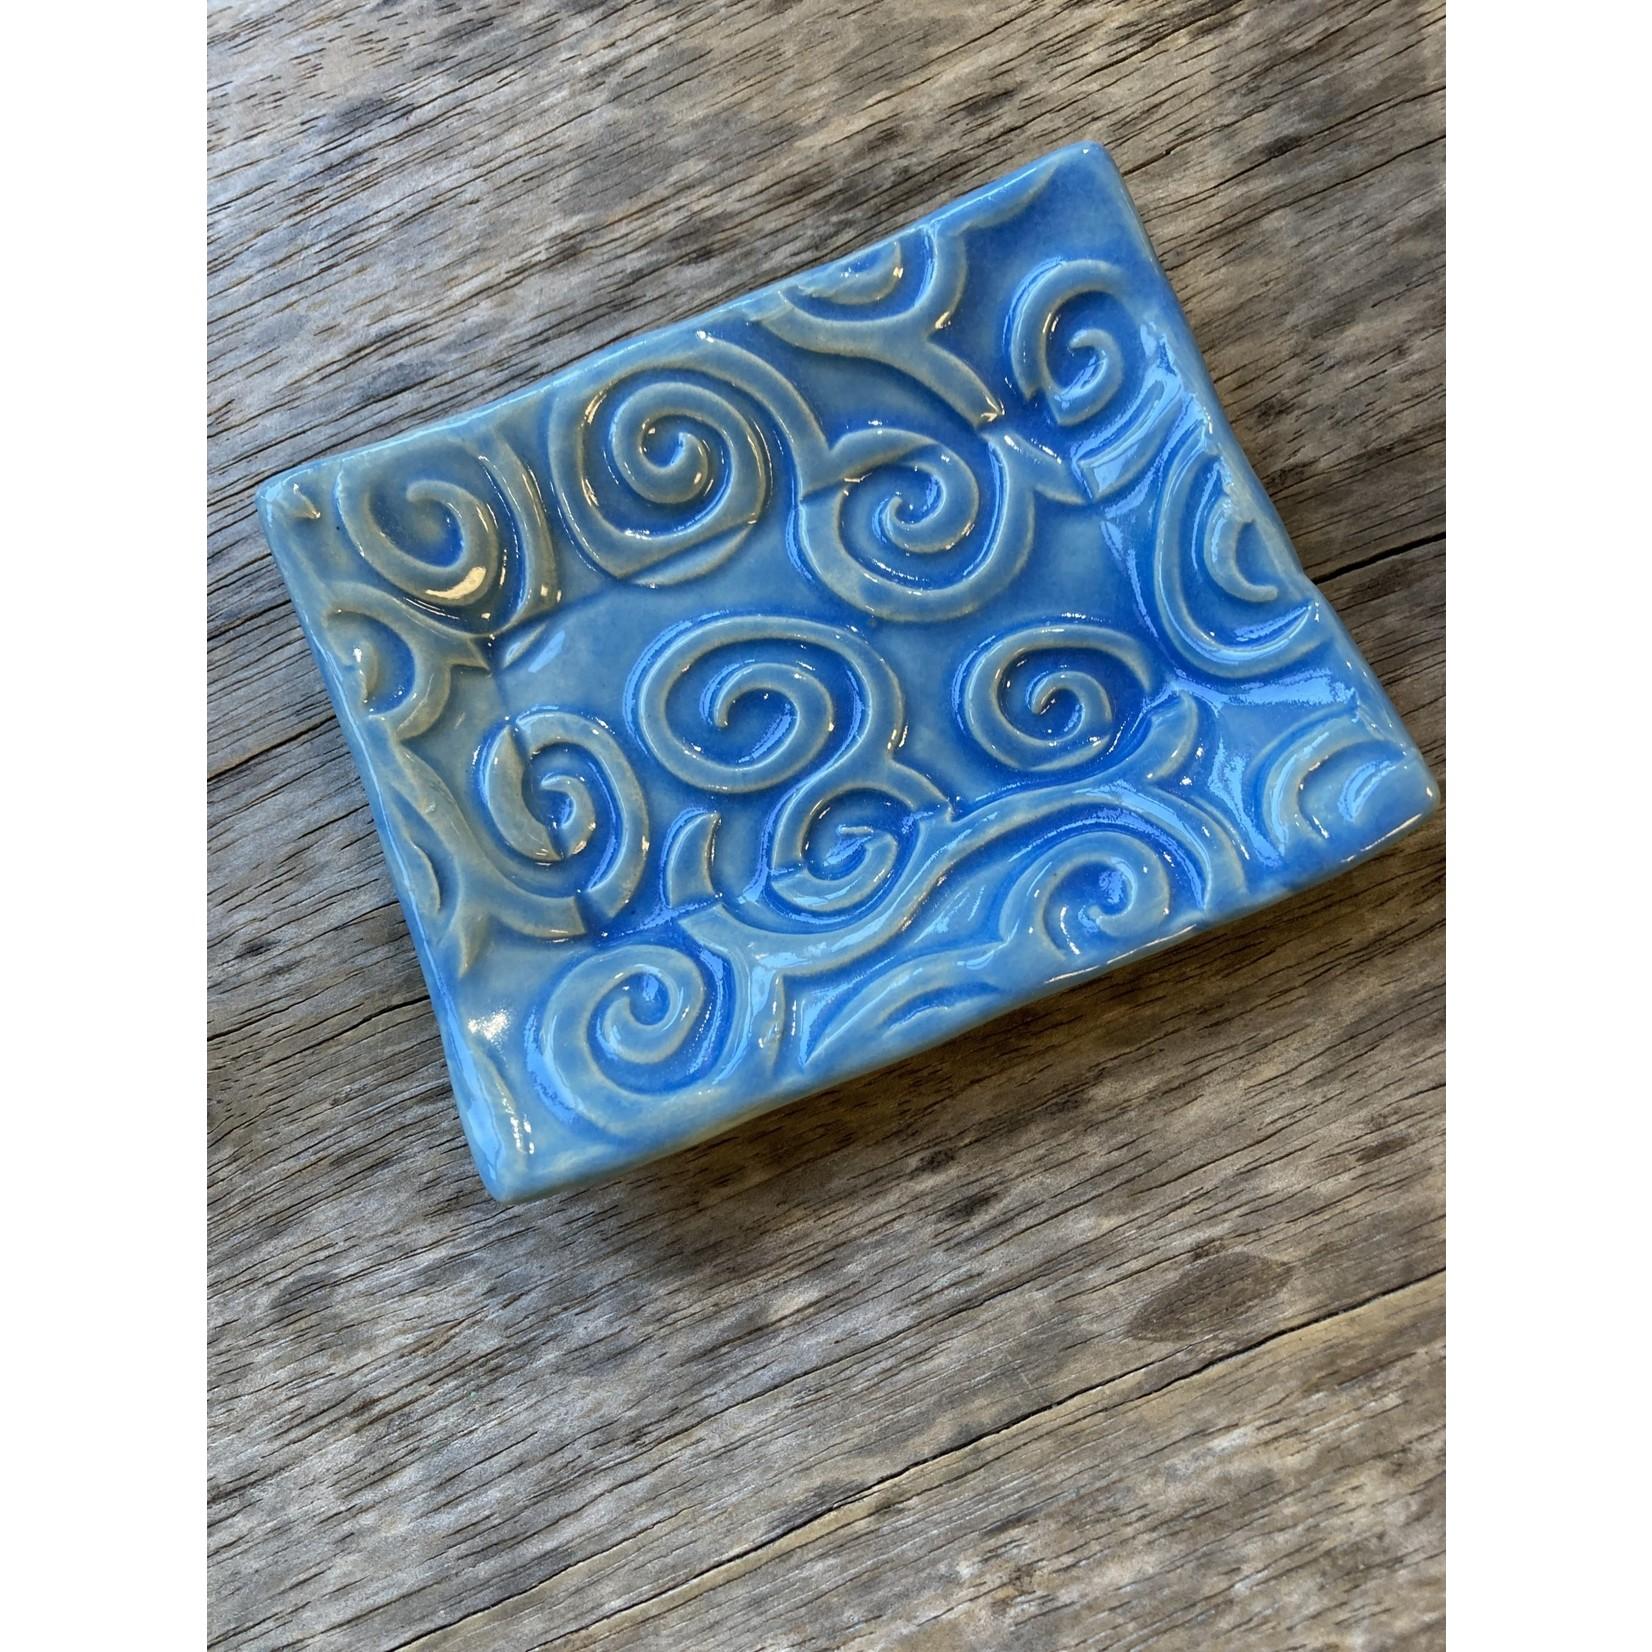 Lorraine Oerth Lorraine Oerth Soap Dish - Spiral Embossed Light Blue